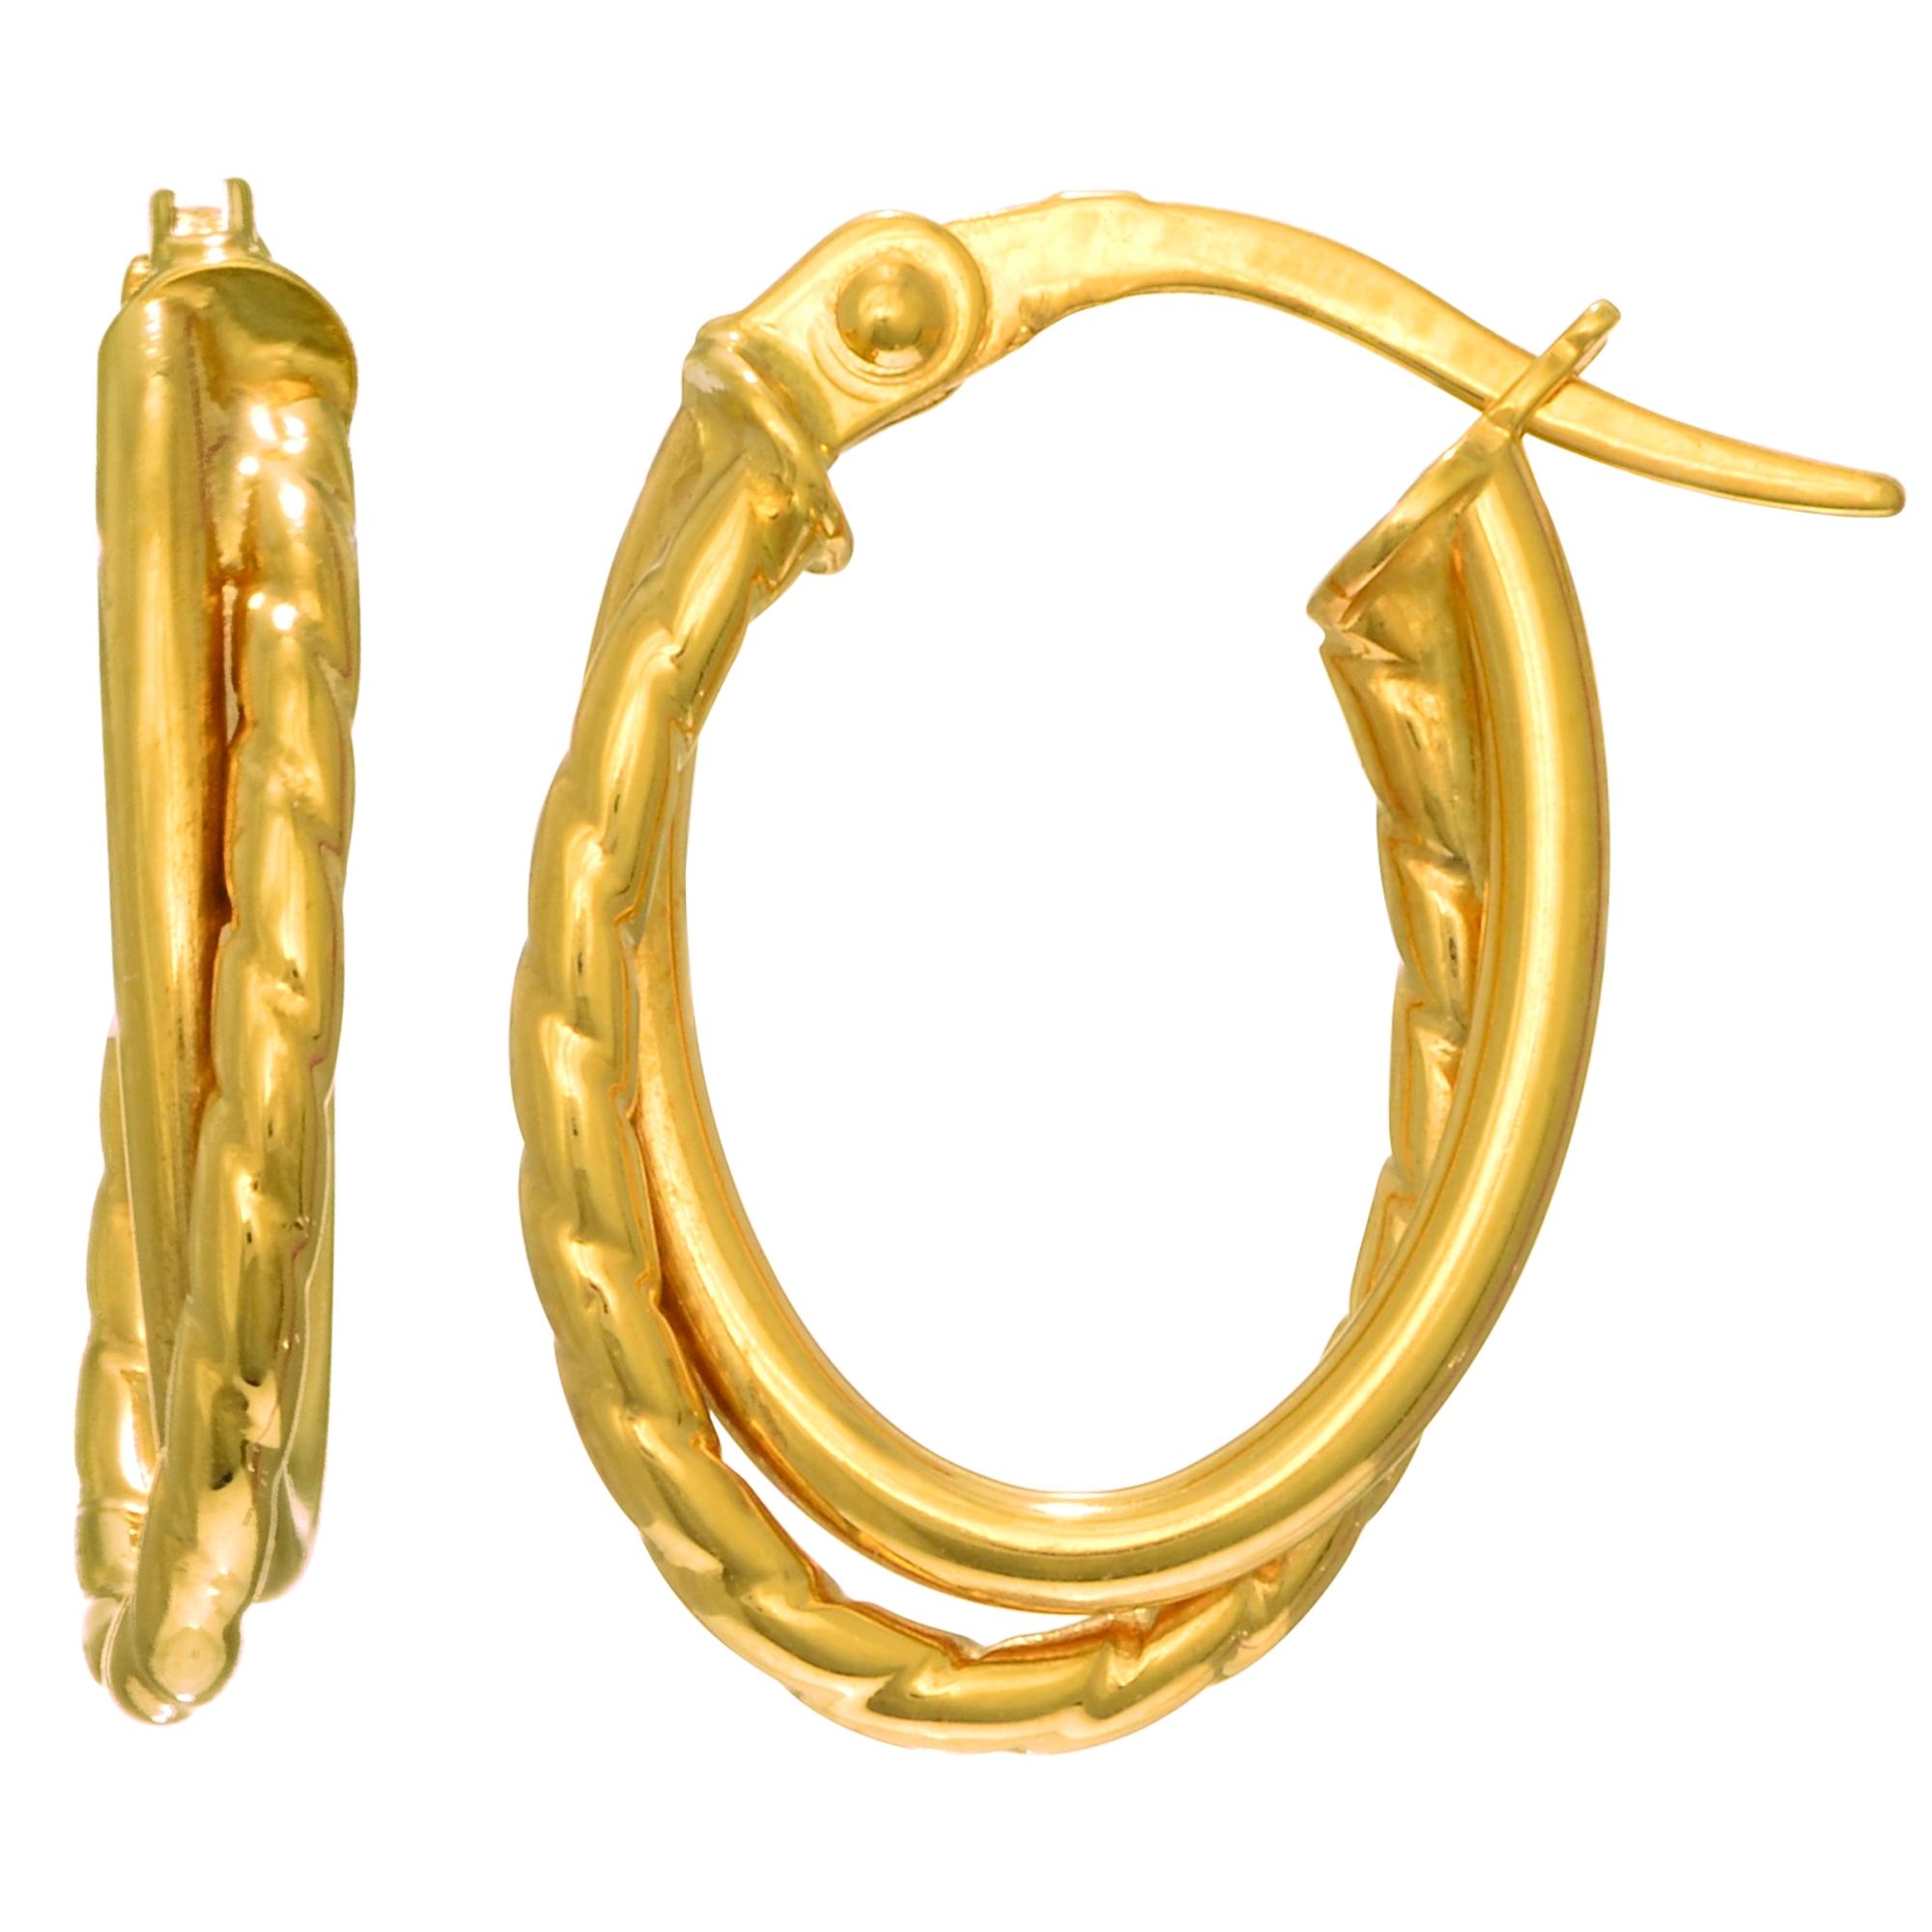 14K Yellow Gold Double Row Oval Hoop Earrings